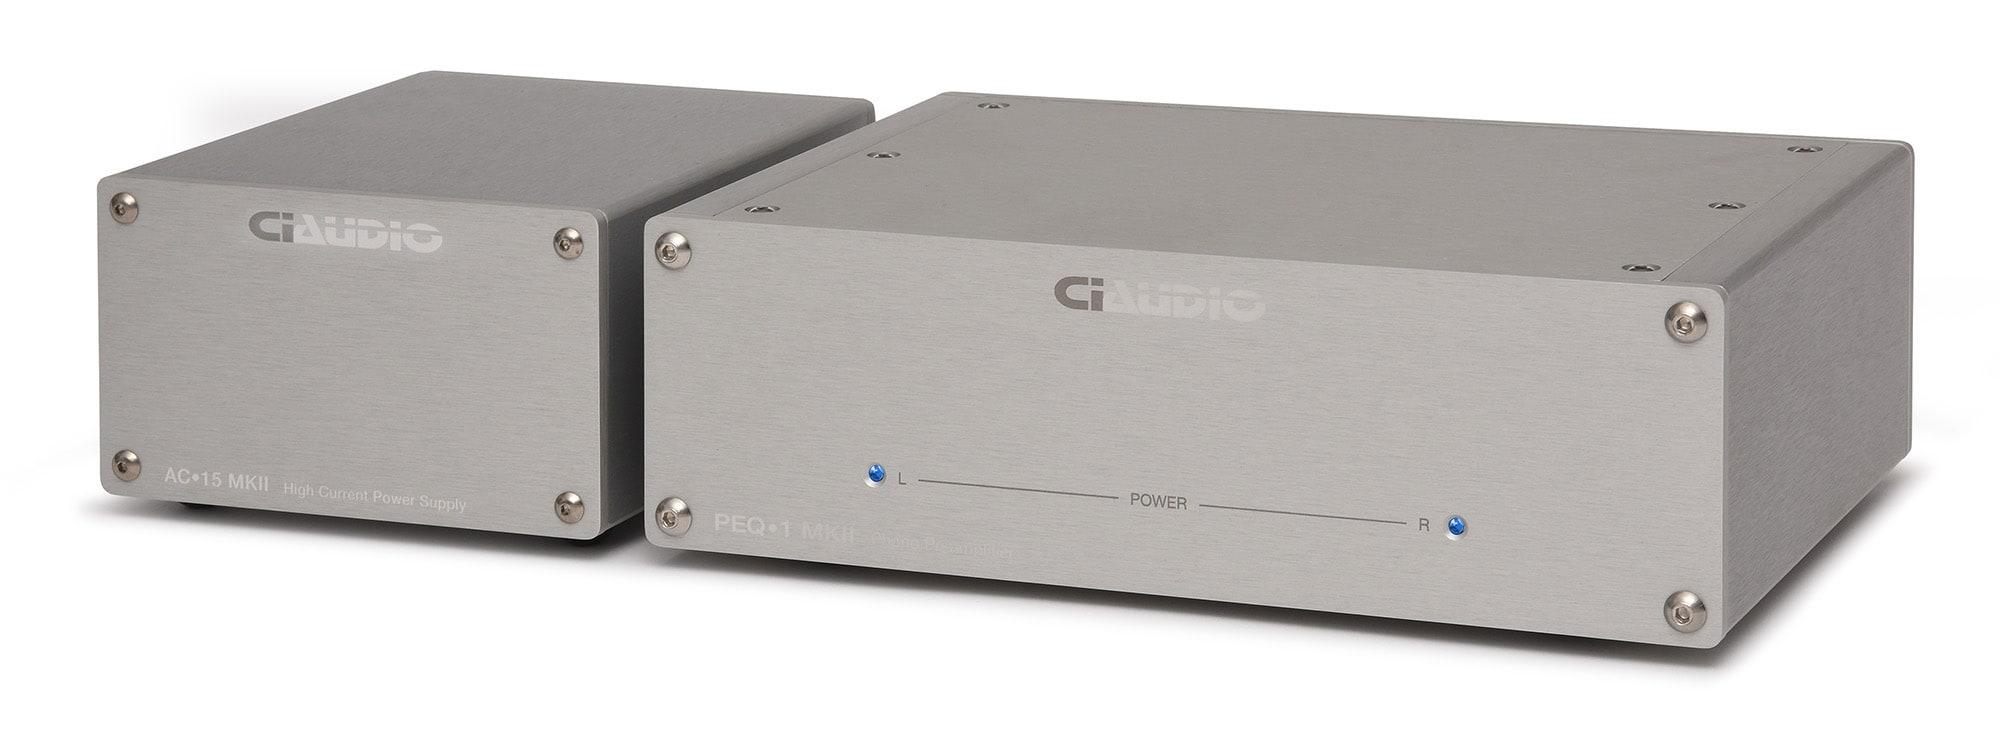 Peq1 Mkii Mm Mc Phono Preamplifier Ac15 Power Supply Ci Audio Circuit